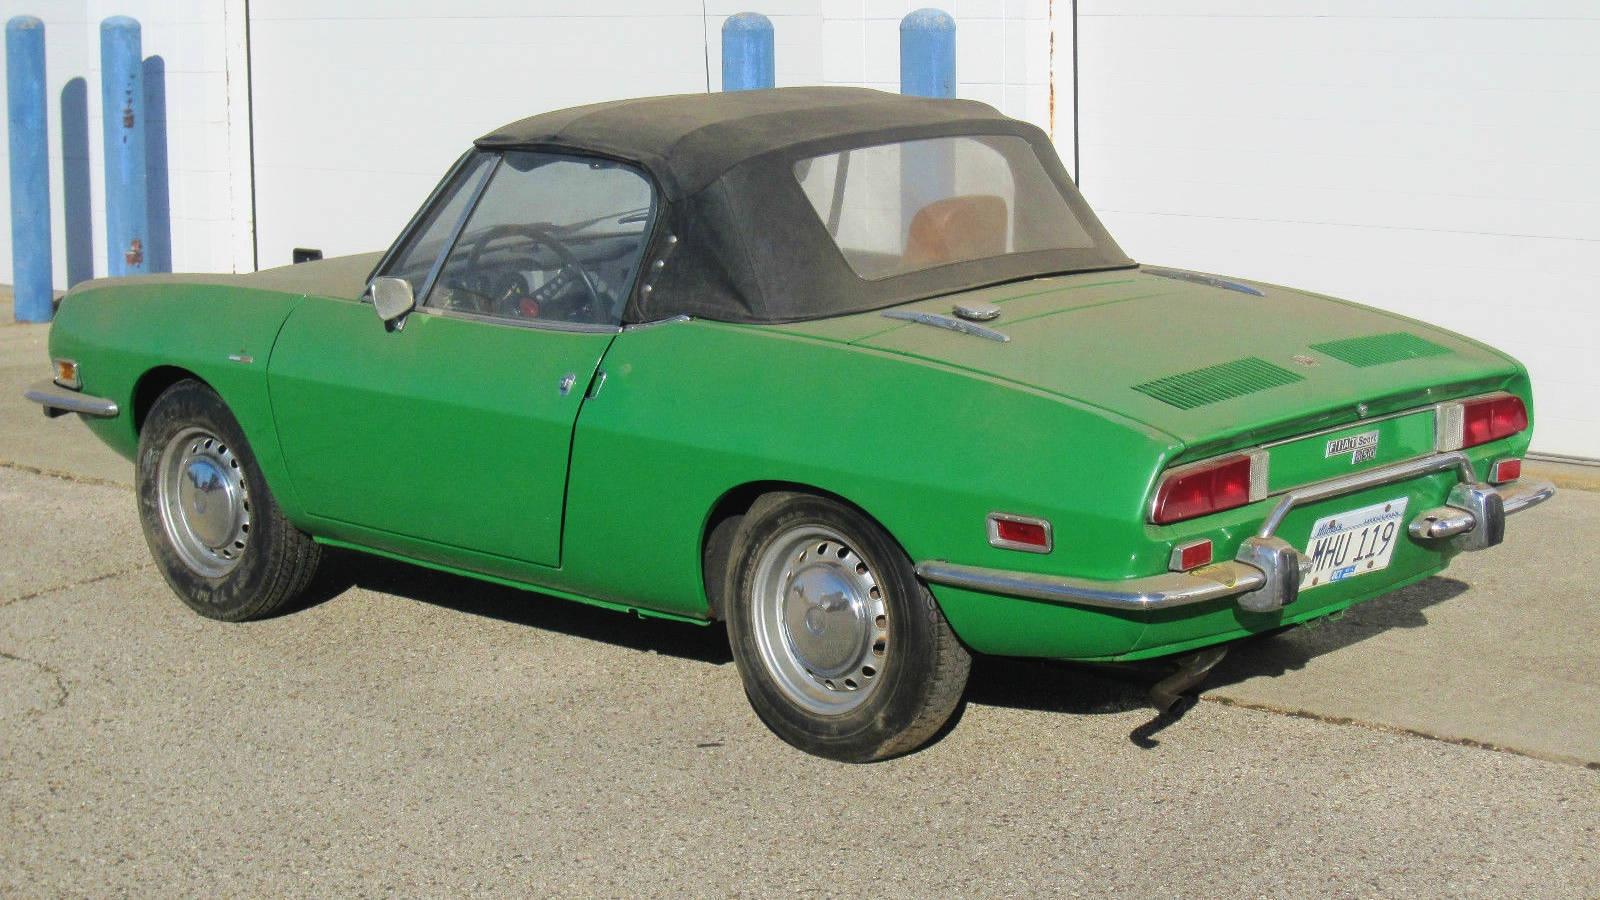 Dusty Little Frog  1972 Fiat 850 Spider